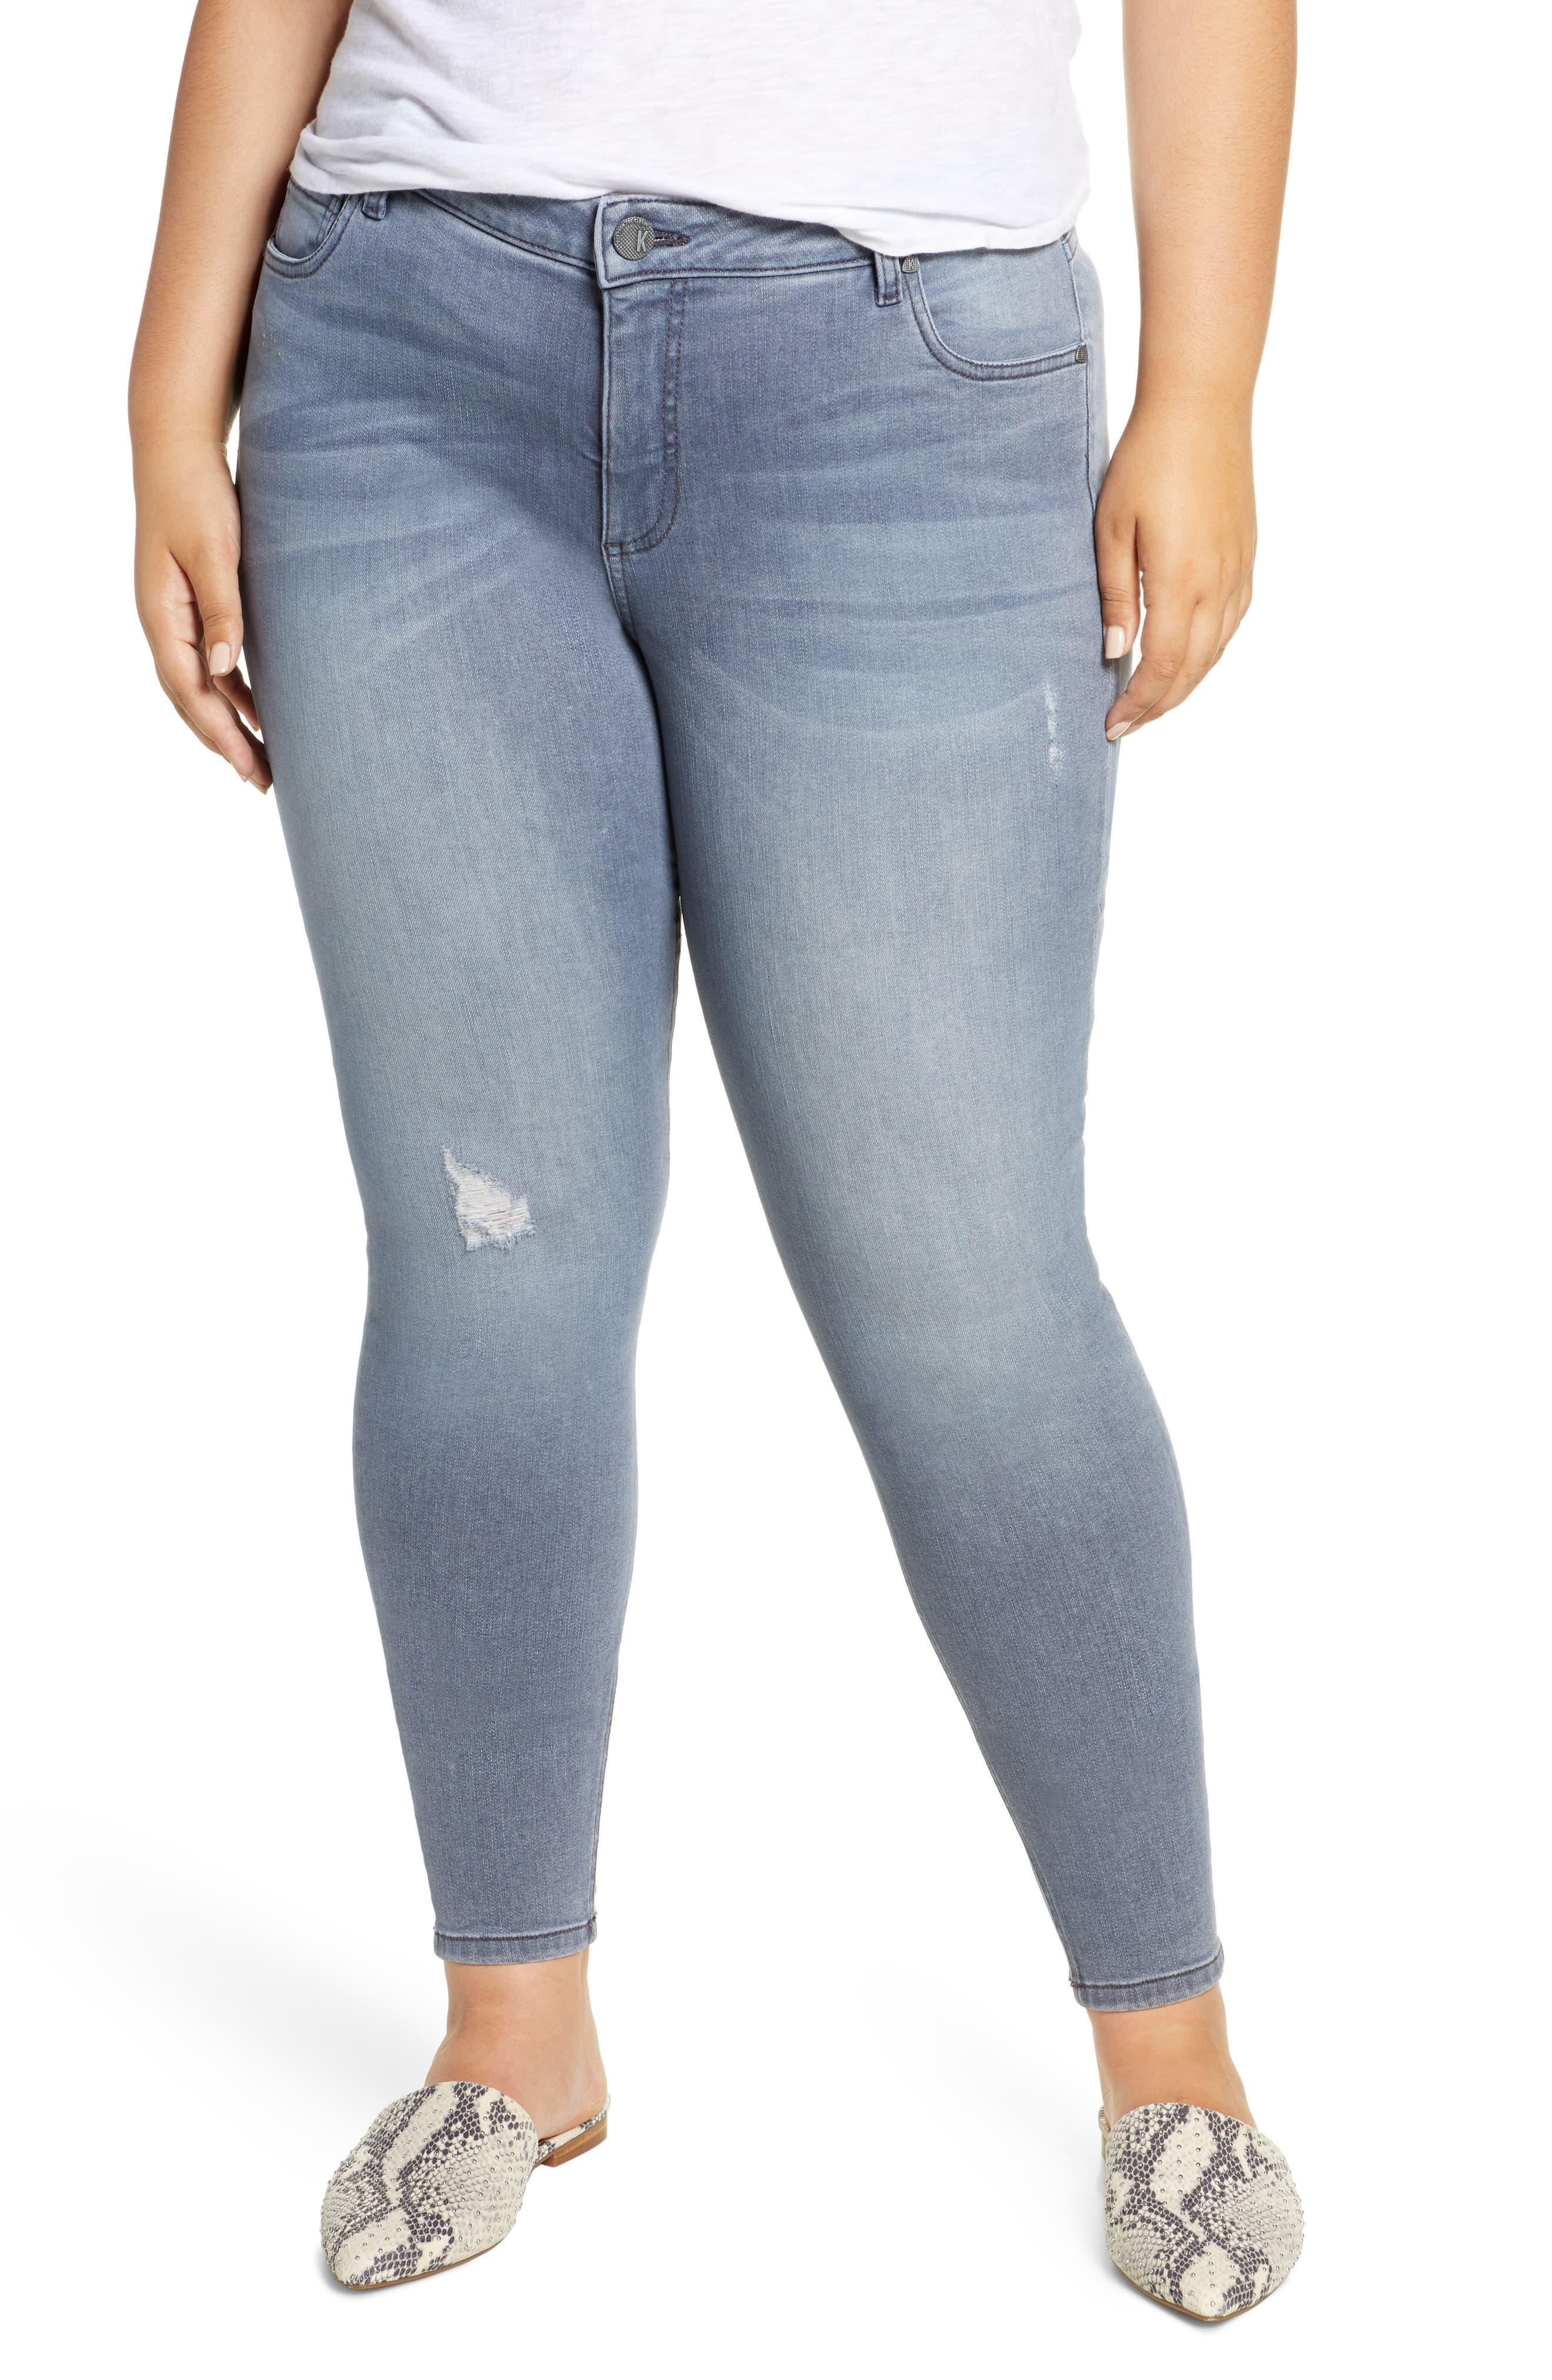 Toothpick Skinny Jeans